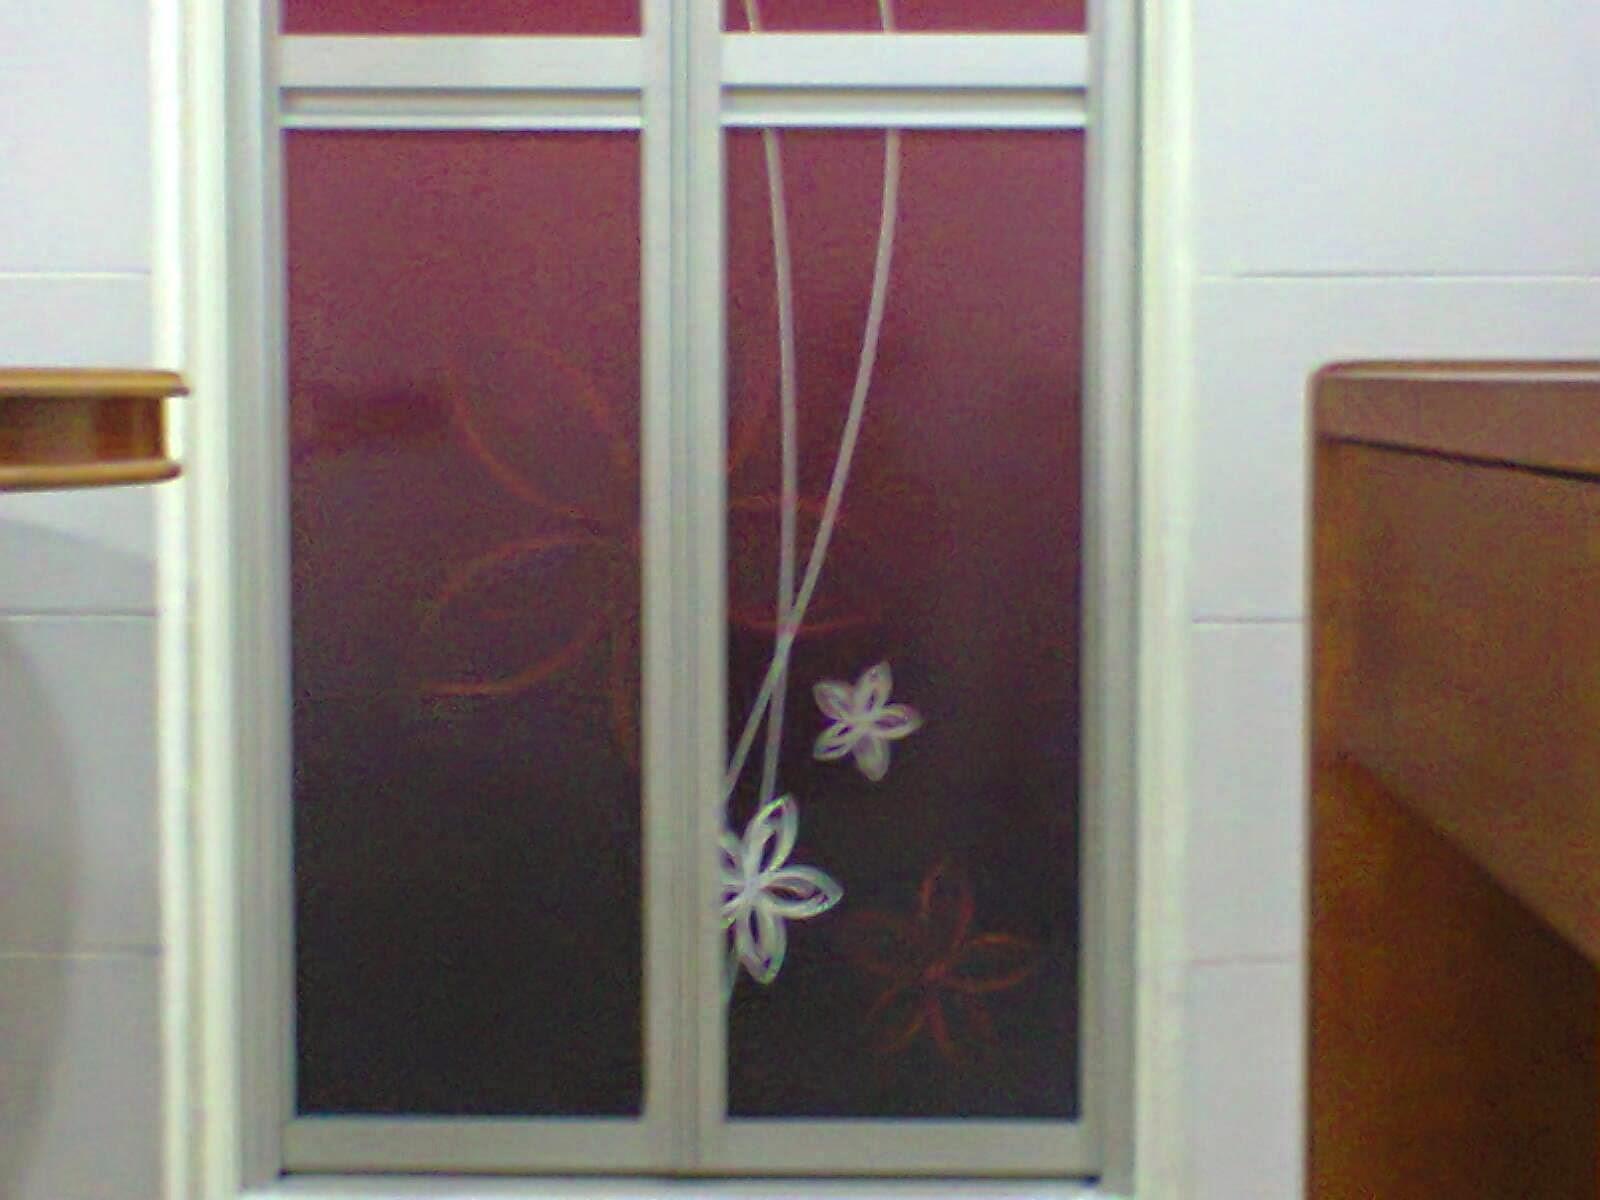 3Gkitchencabinet.blogspot.com: PINTU BILIK AIR (B-FOLD)